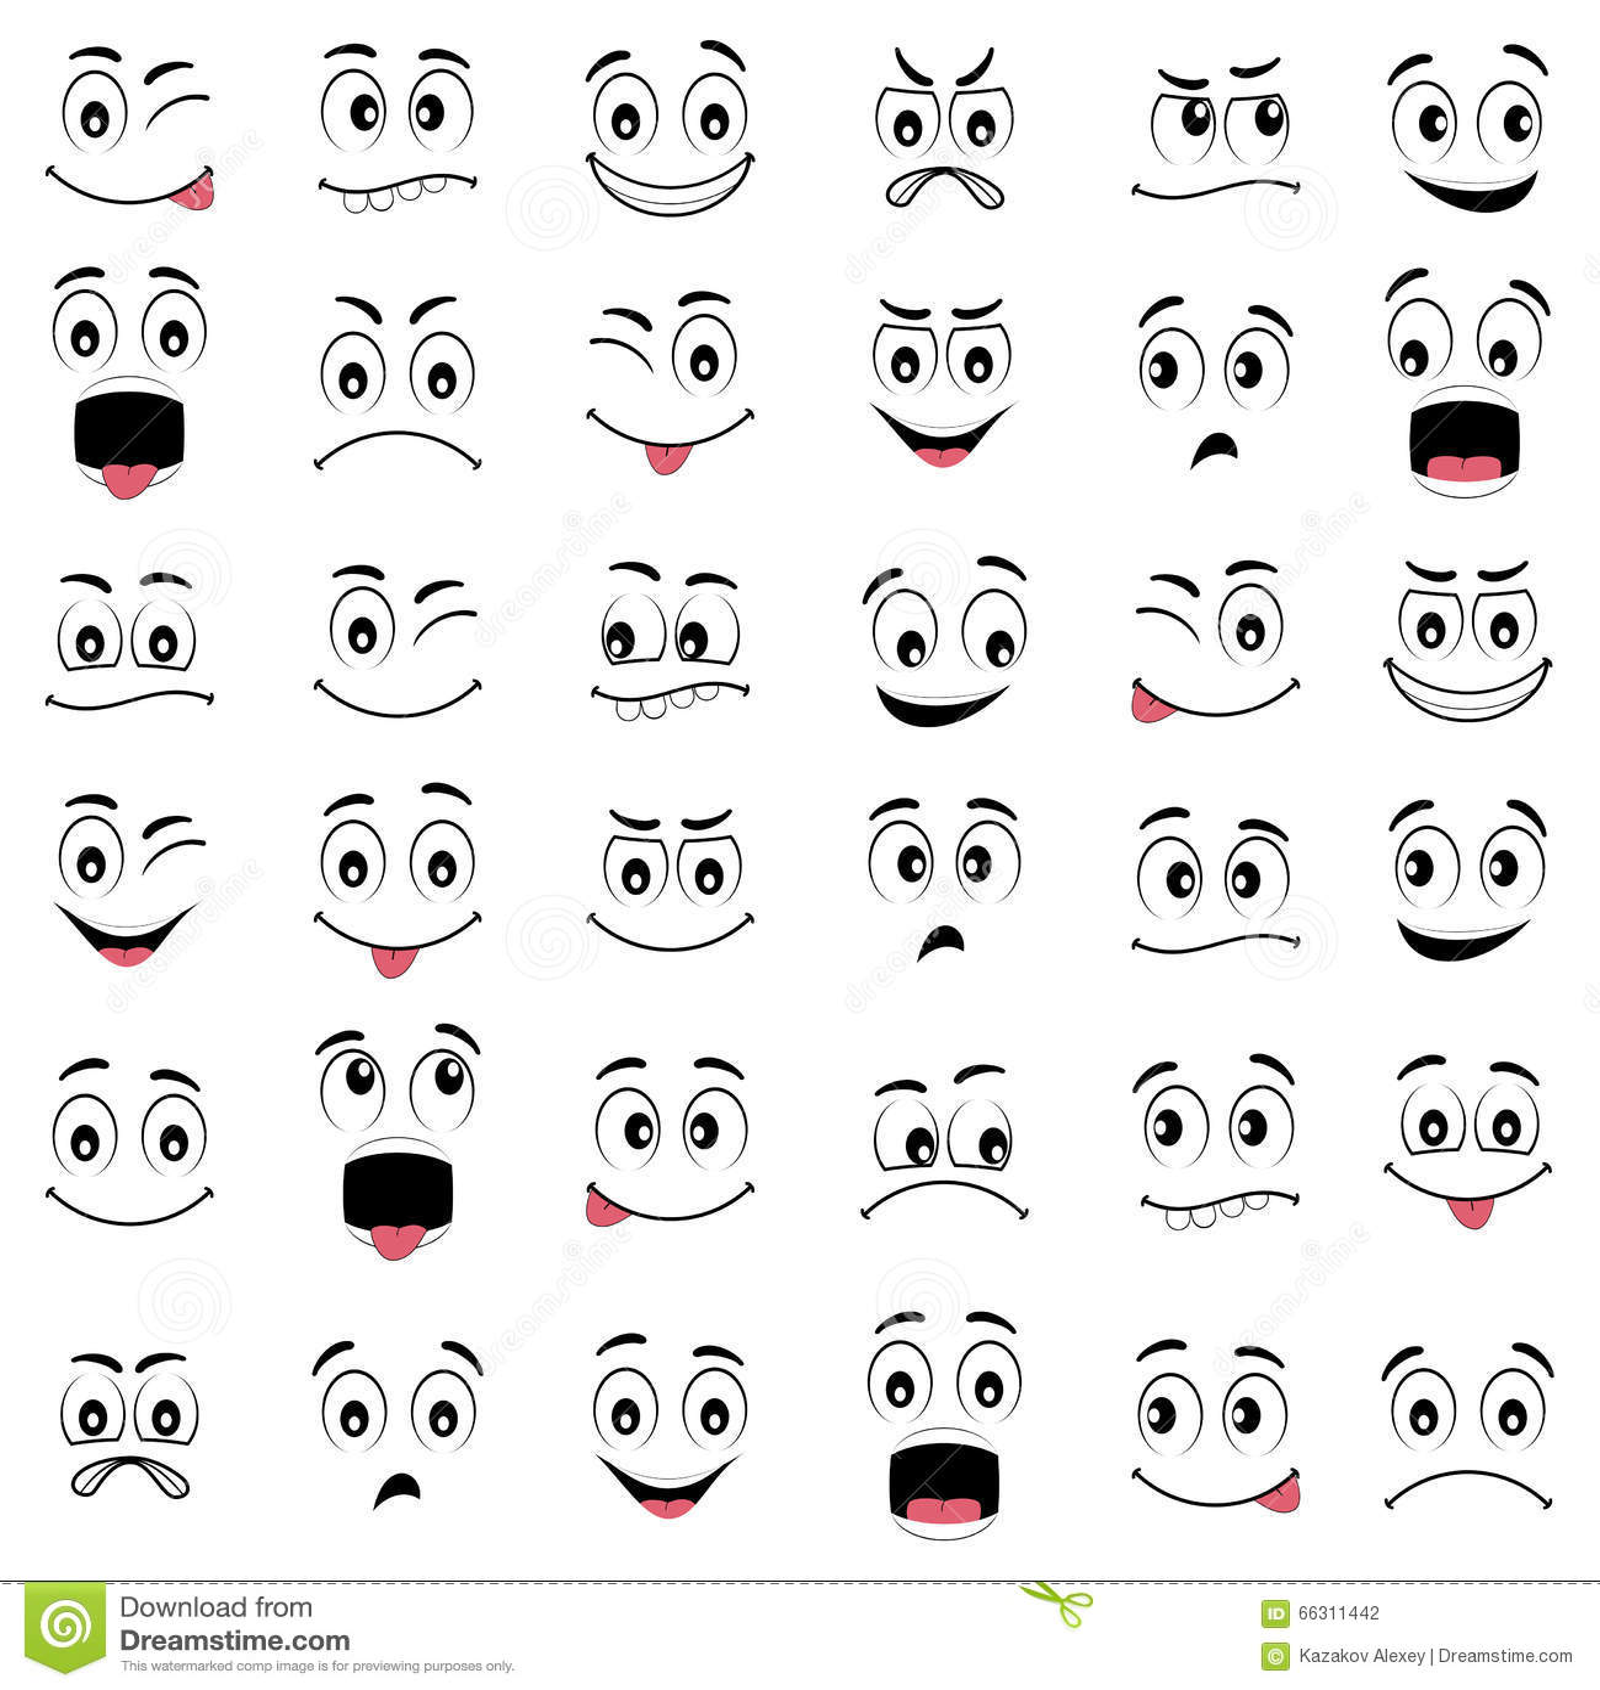 Evil Emoticon Cartoon Design Royalty Free Illustration